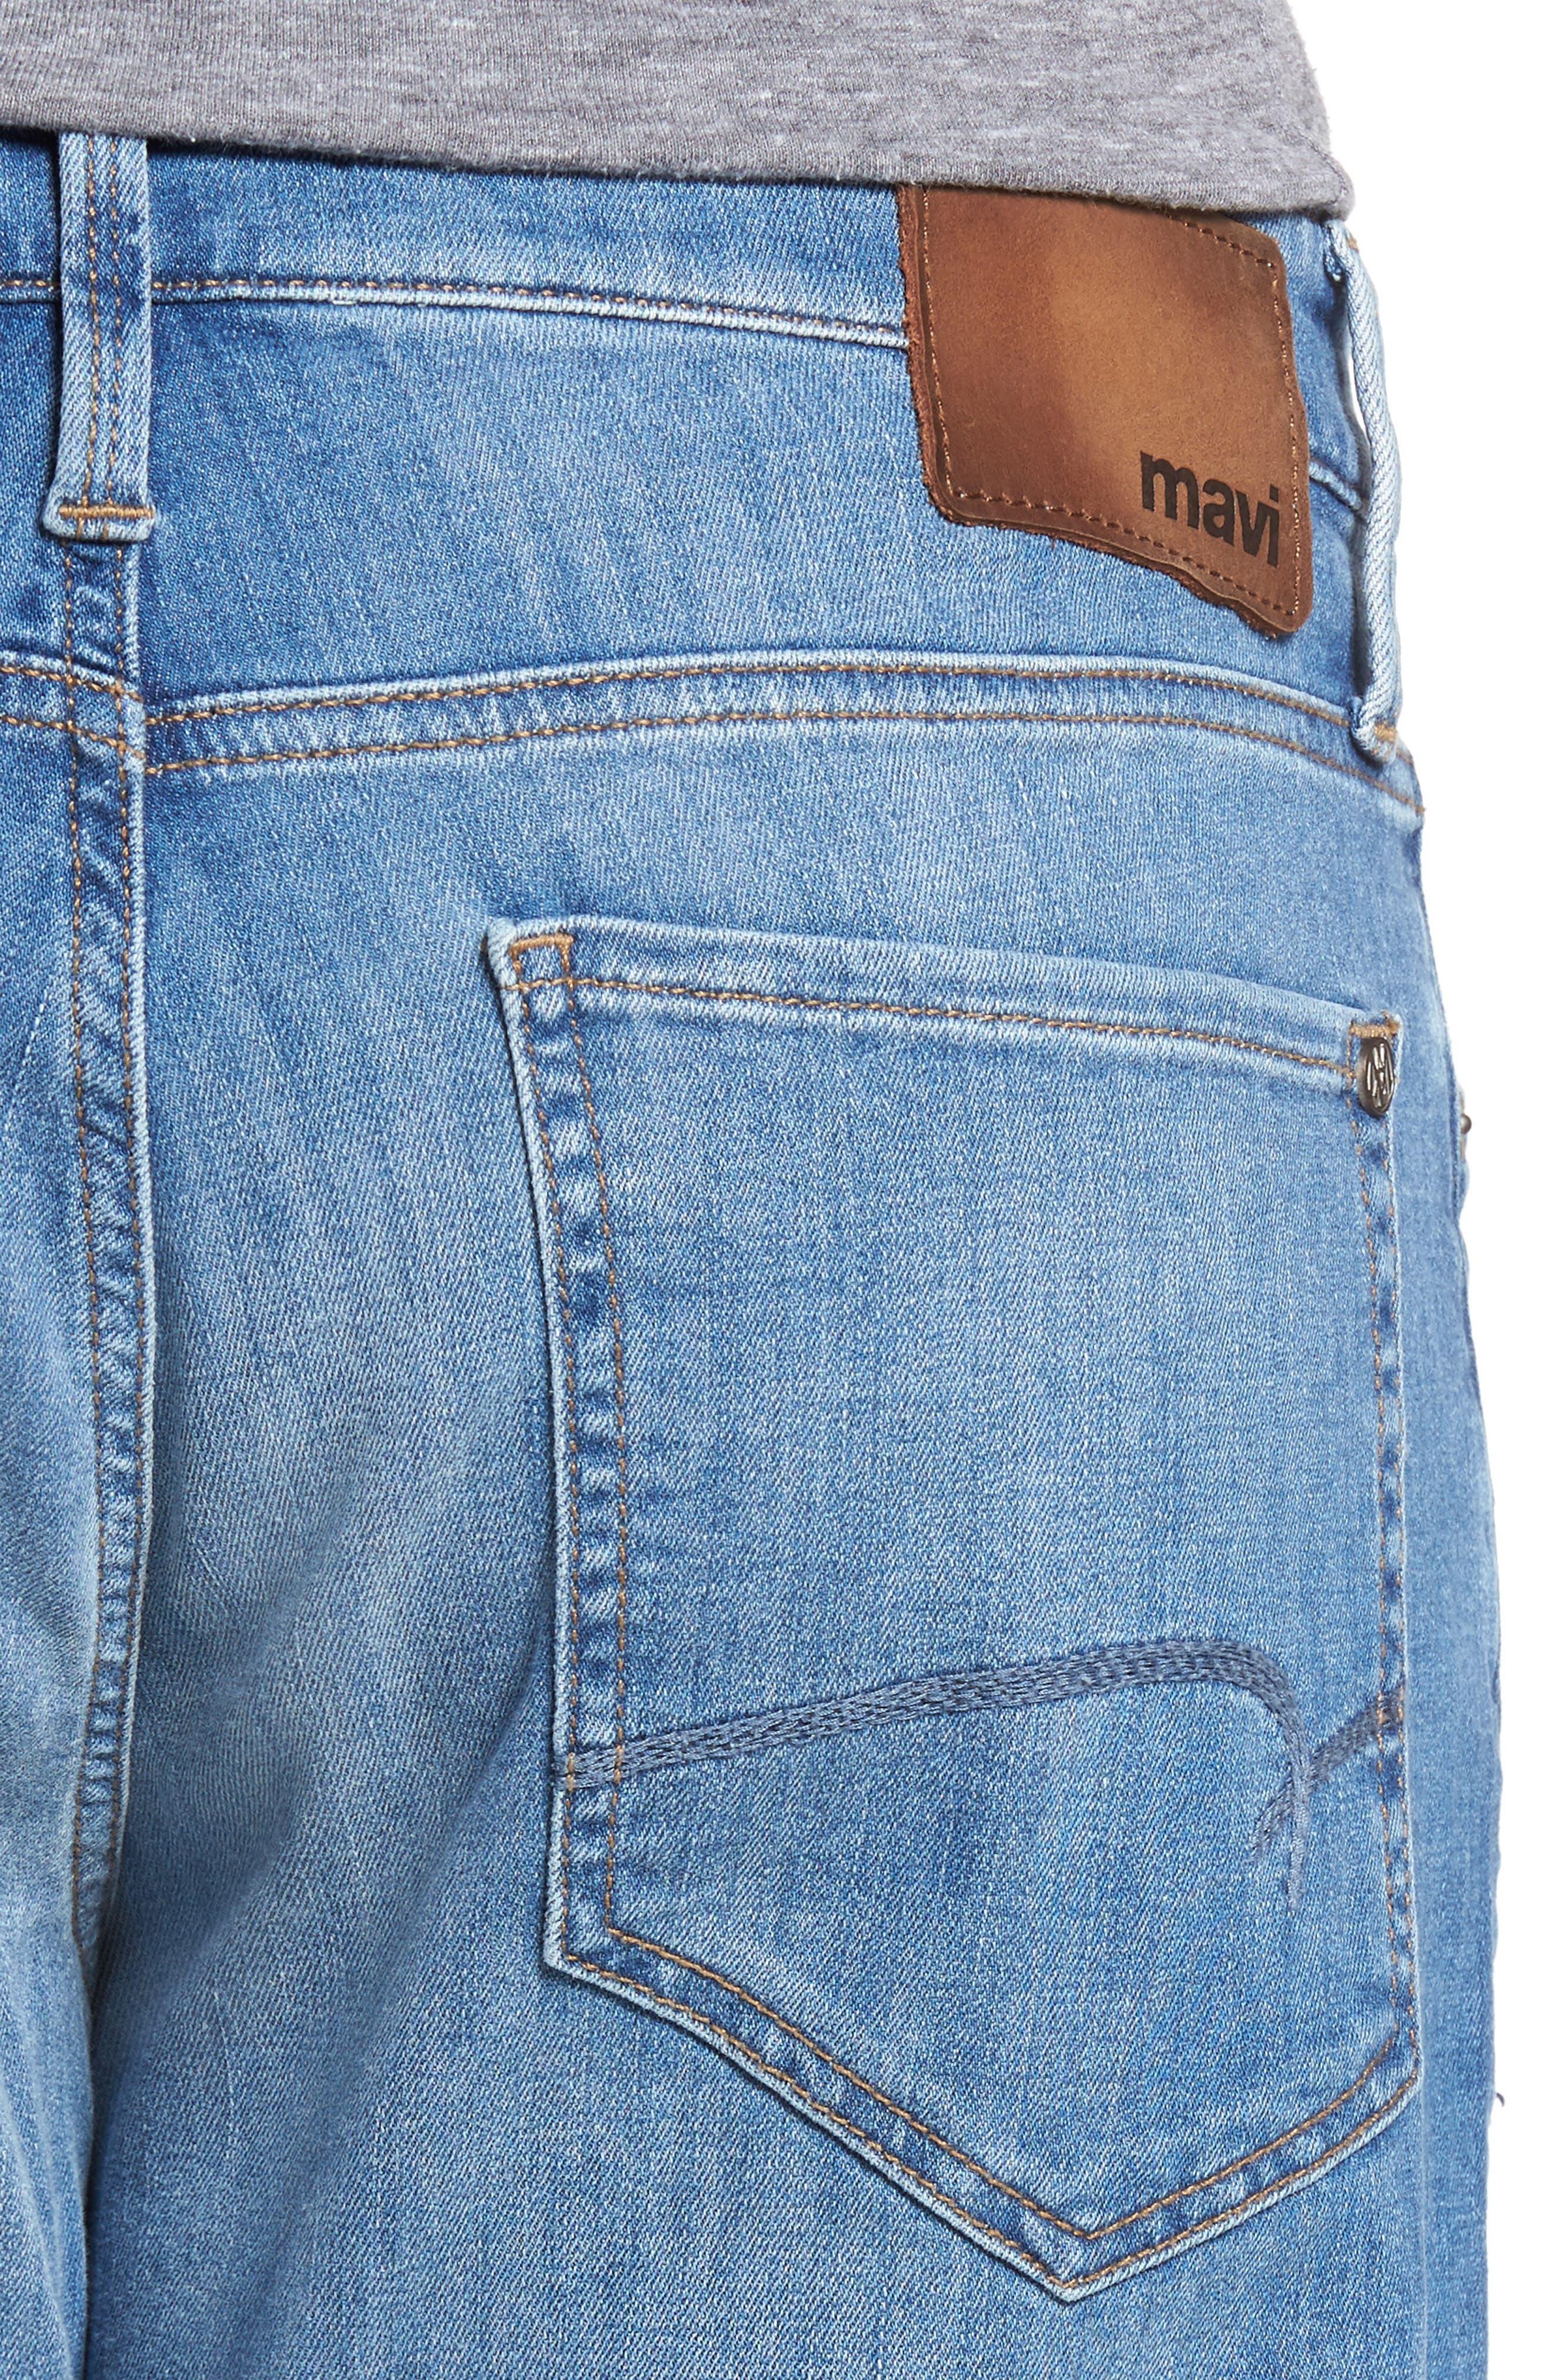 Myles Straight Leg Jeans,                             Alternate thumbnail 4, color,                             Mid Blue Portland